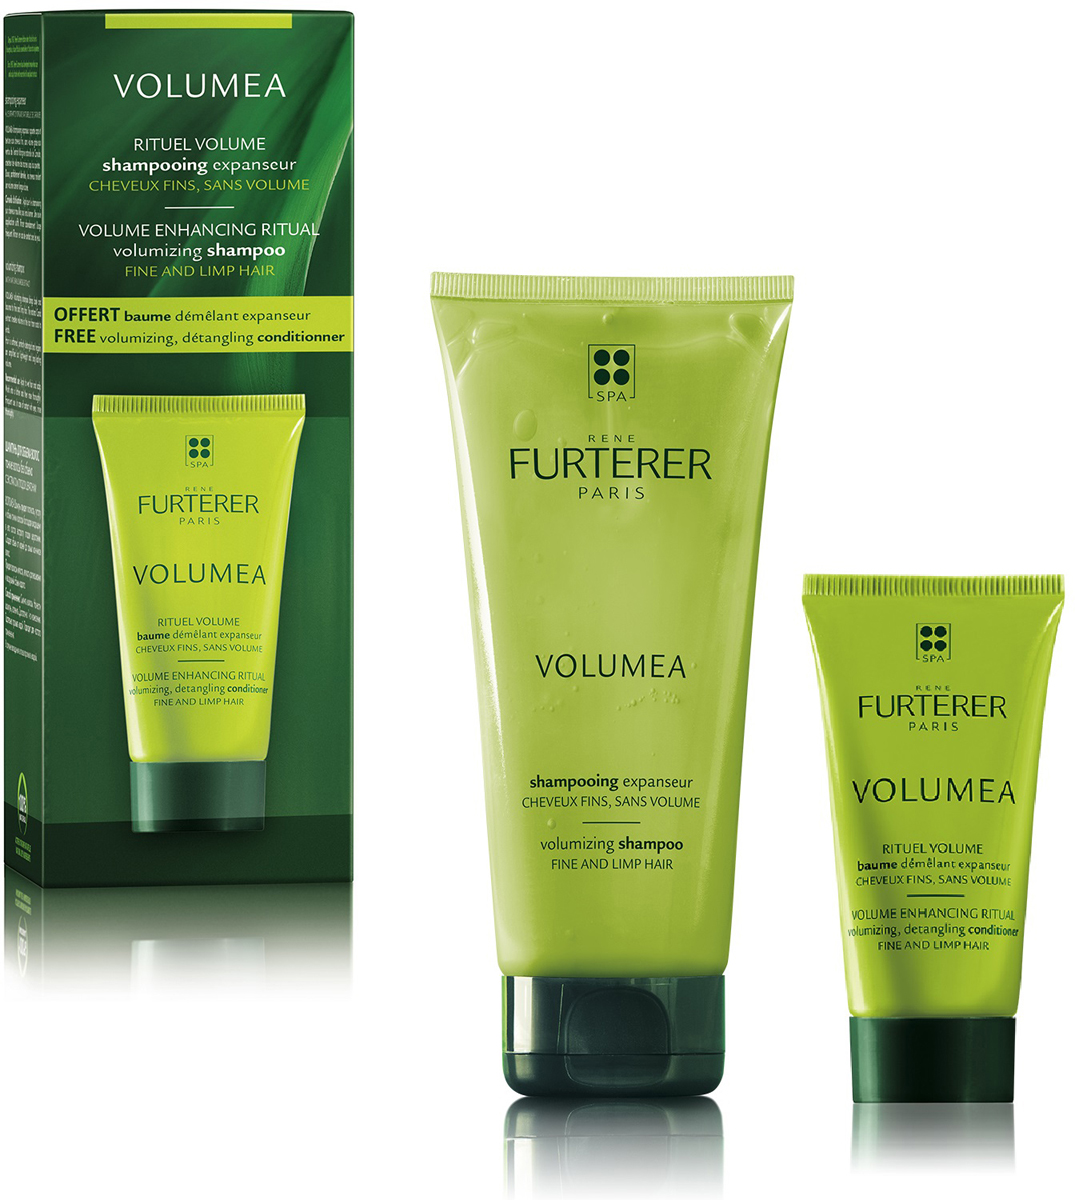 Rene Набор Для объема волос Furterer Volumea: Шампунь, 200 мл + Бальзам, 30 мл